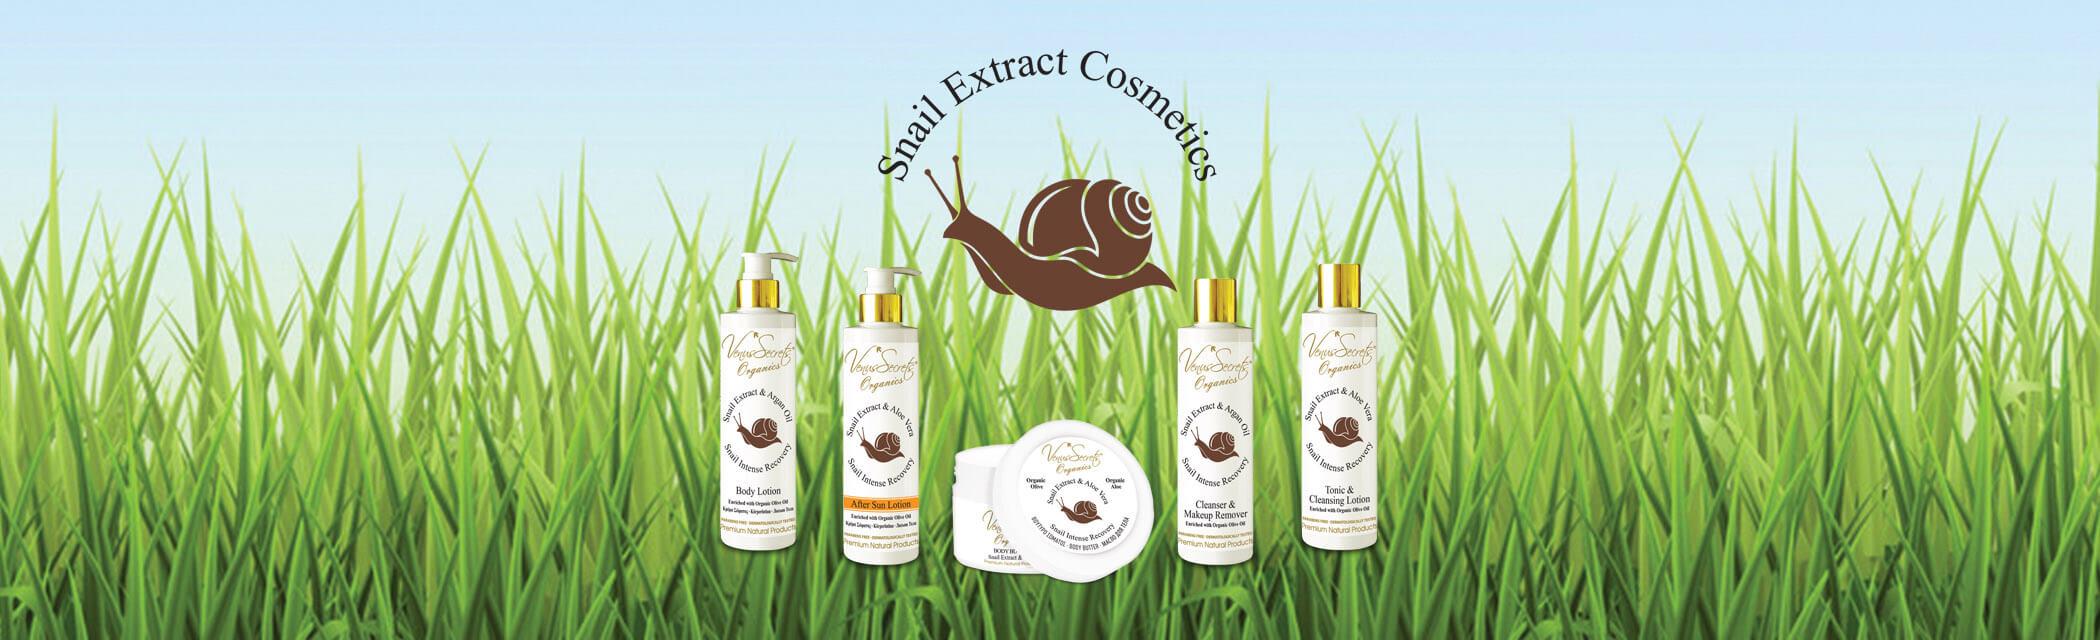 Venus Secrets Snail Extract Cosmetics